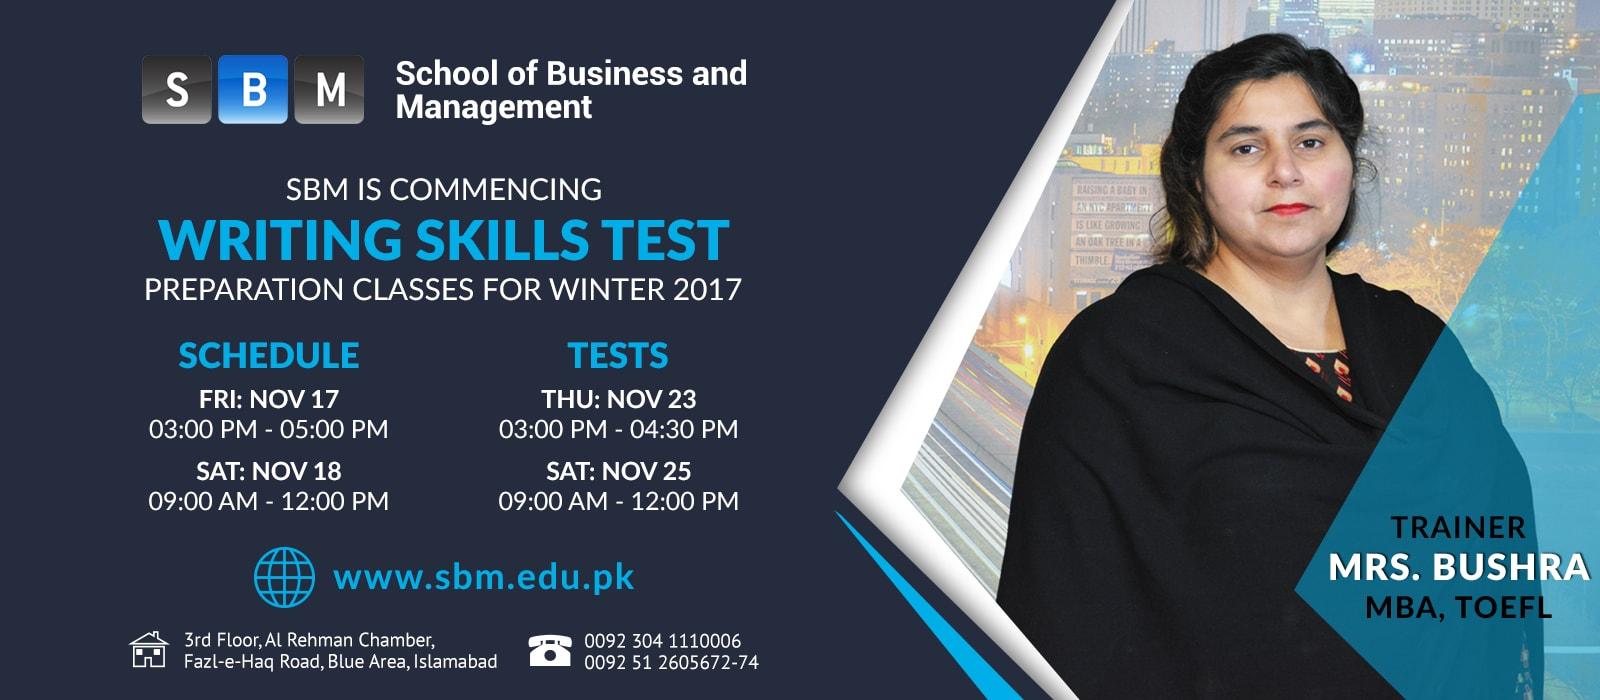 Writing Skills Test Classes starting from 17 Nov